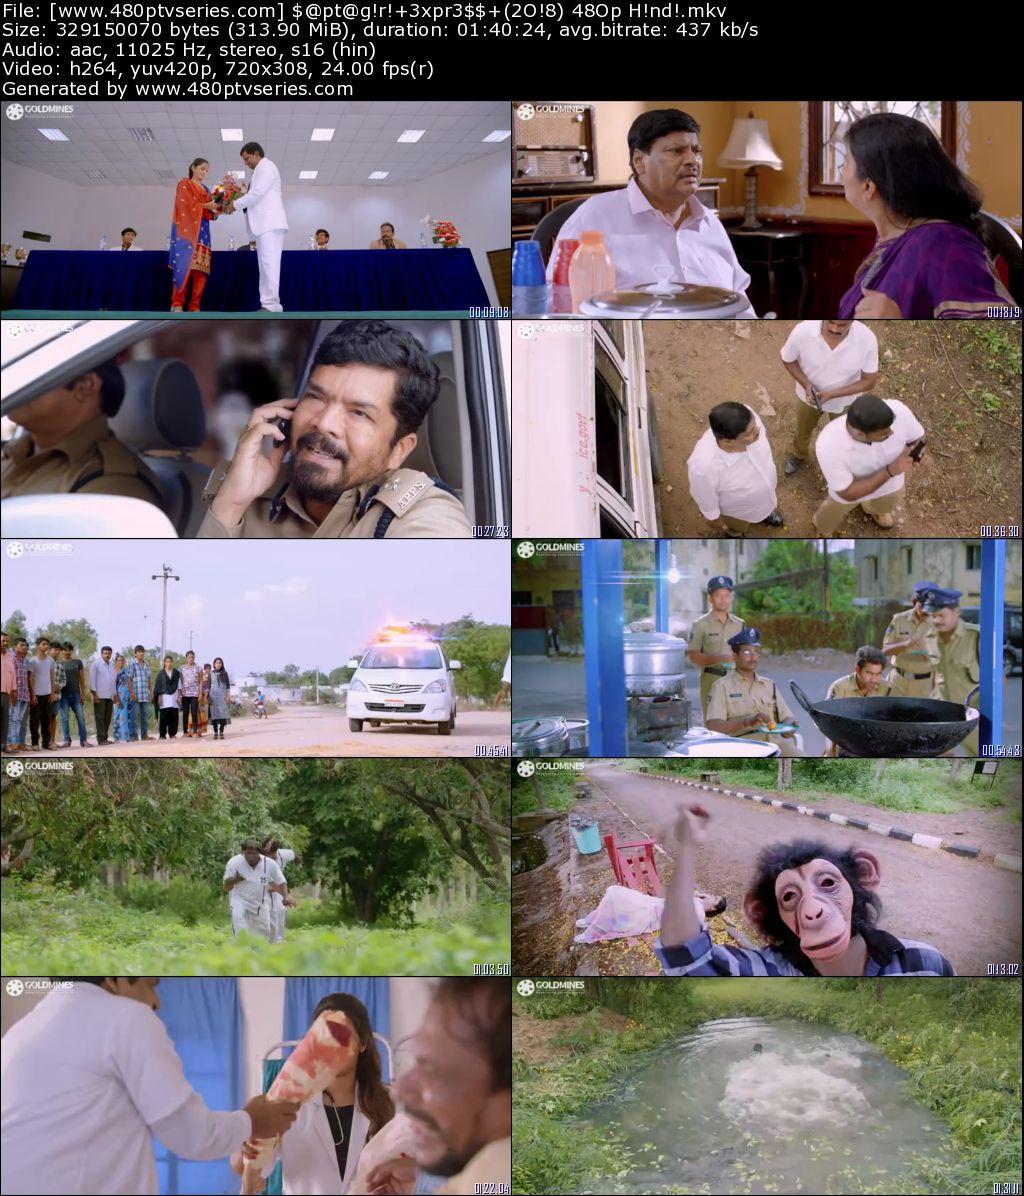 Saptagiri Express 2016 300MB Full Hindi Dubbed Movie Download 480p HDRip Free Watch Online Full Movie Download Worldfree4u 9xmovies